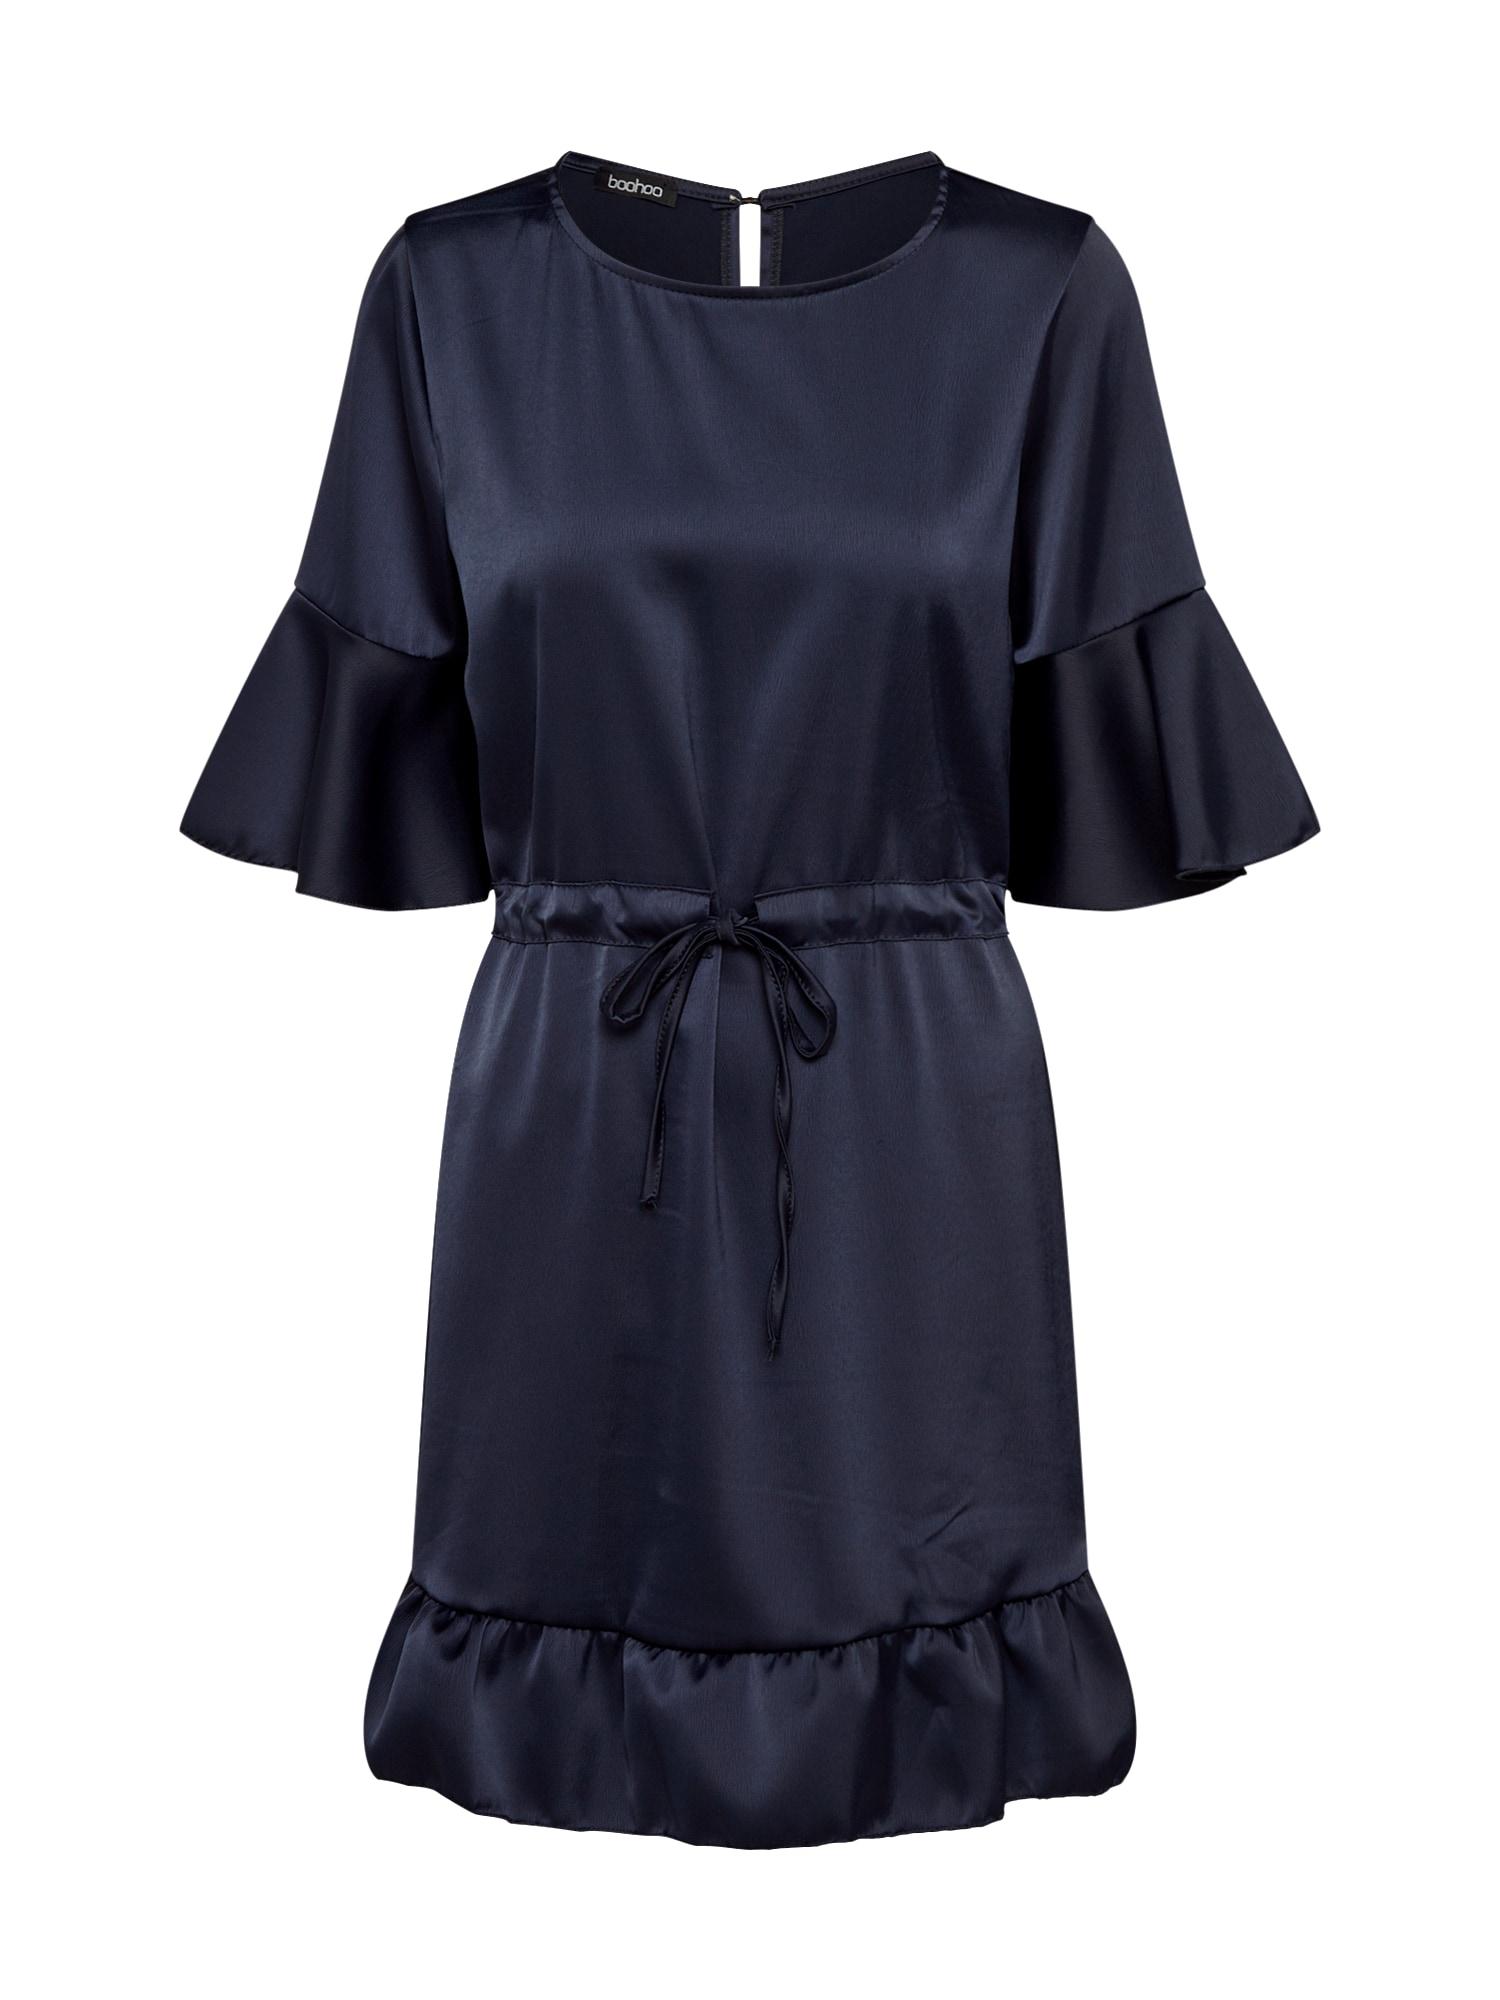 Šaty SATIN DRAWCORD námořnická modř Boohoo